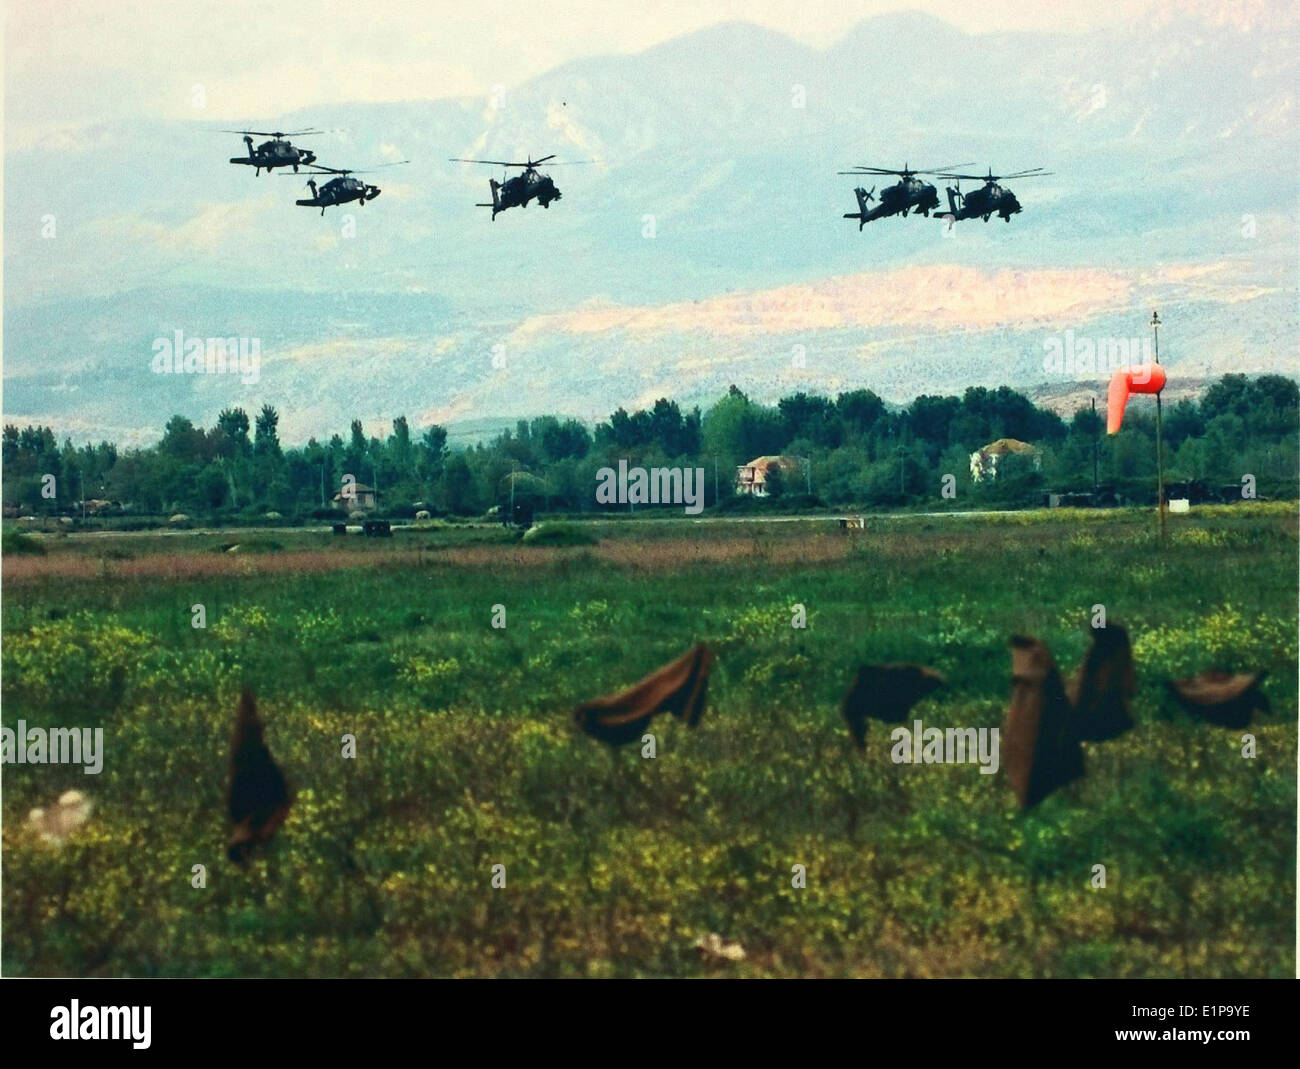 Operation Allied Force Yugoslavia Stock Photo: 69946898 - Alamy